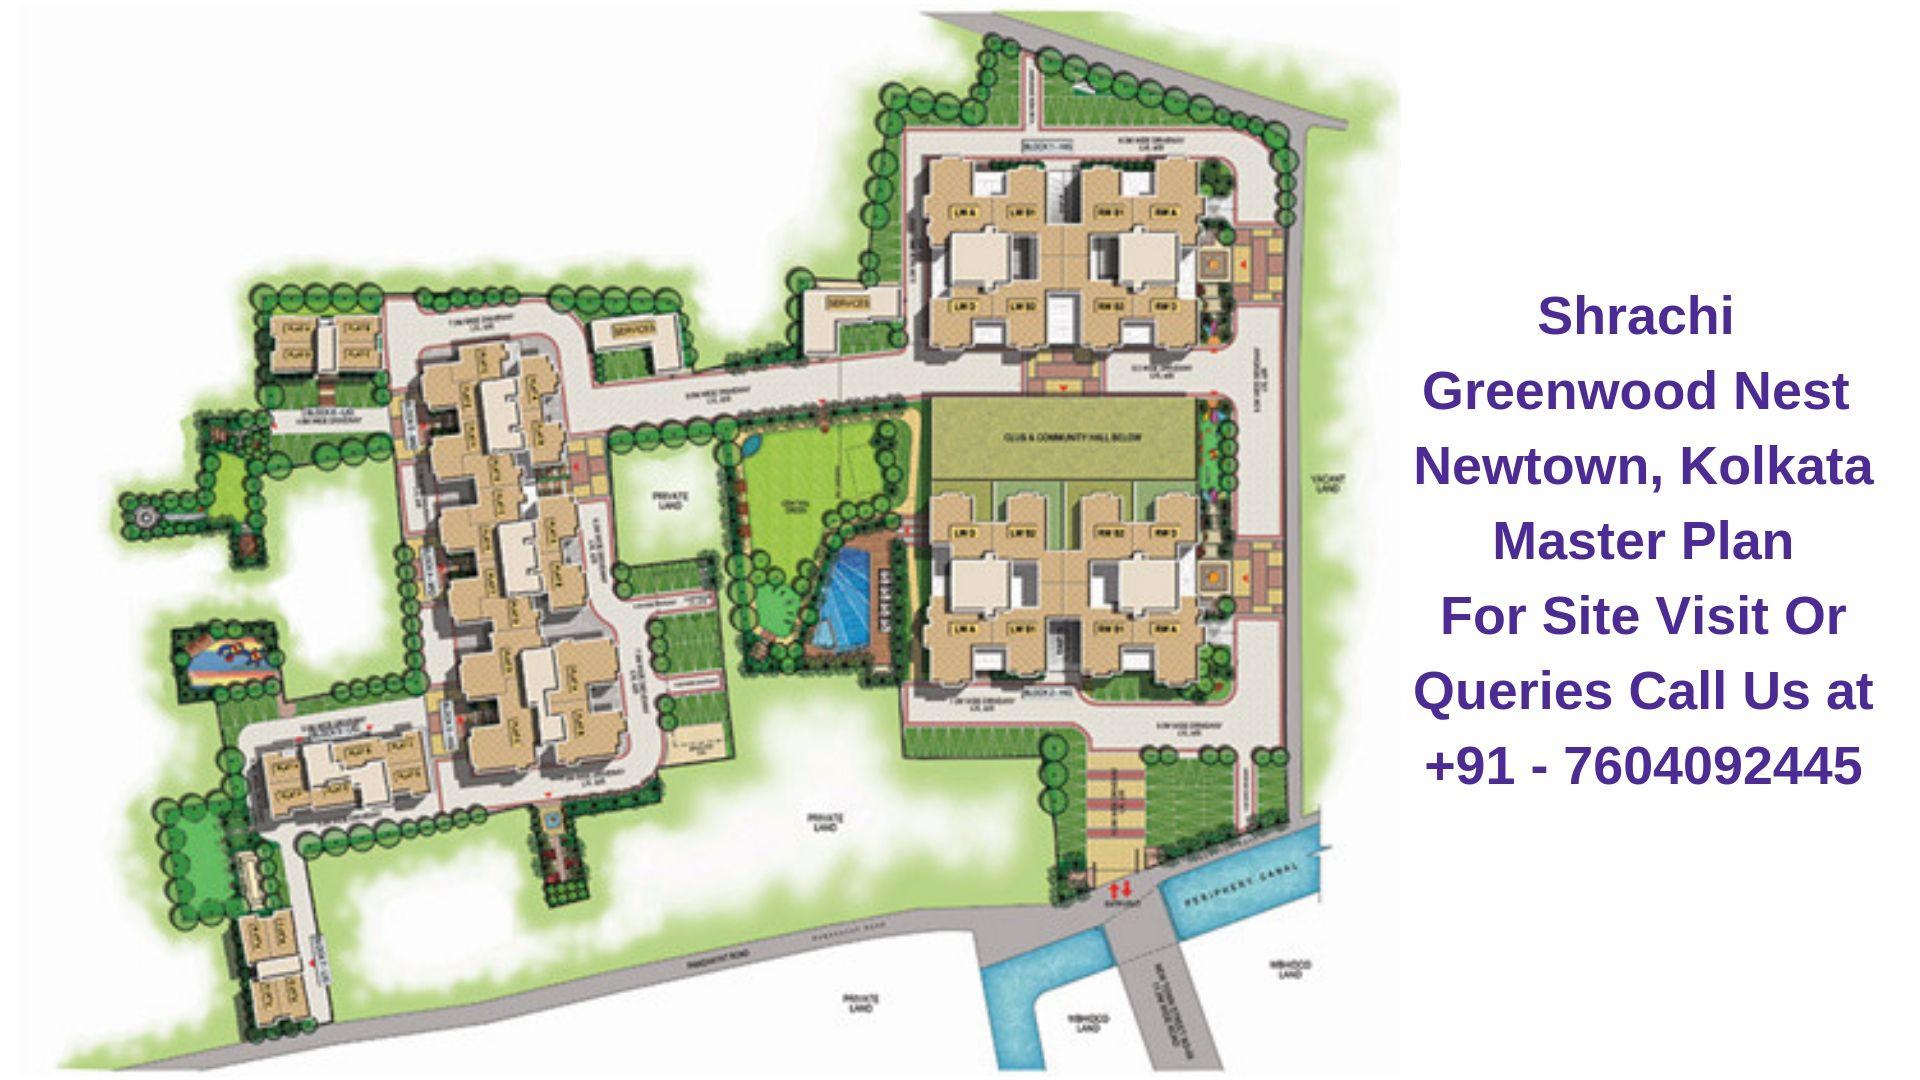 Shrachi Greenwood Nest Newtown, Kolkata Master Plan